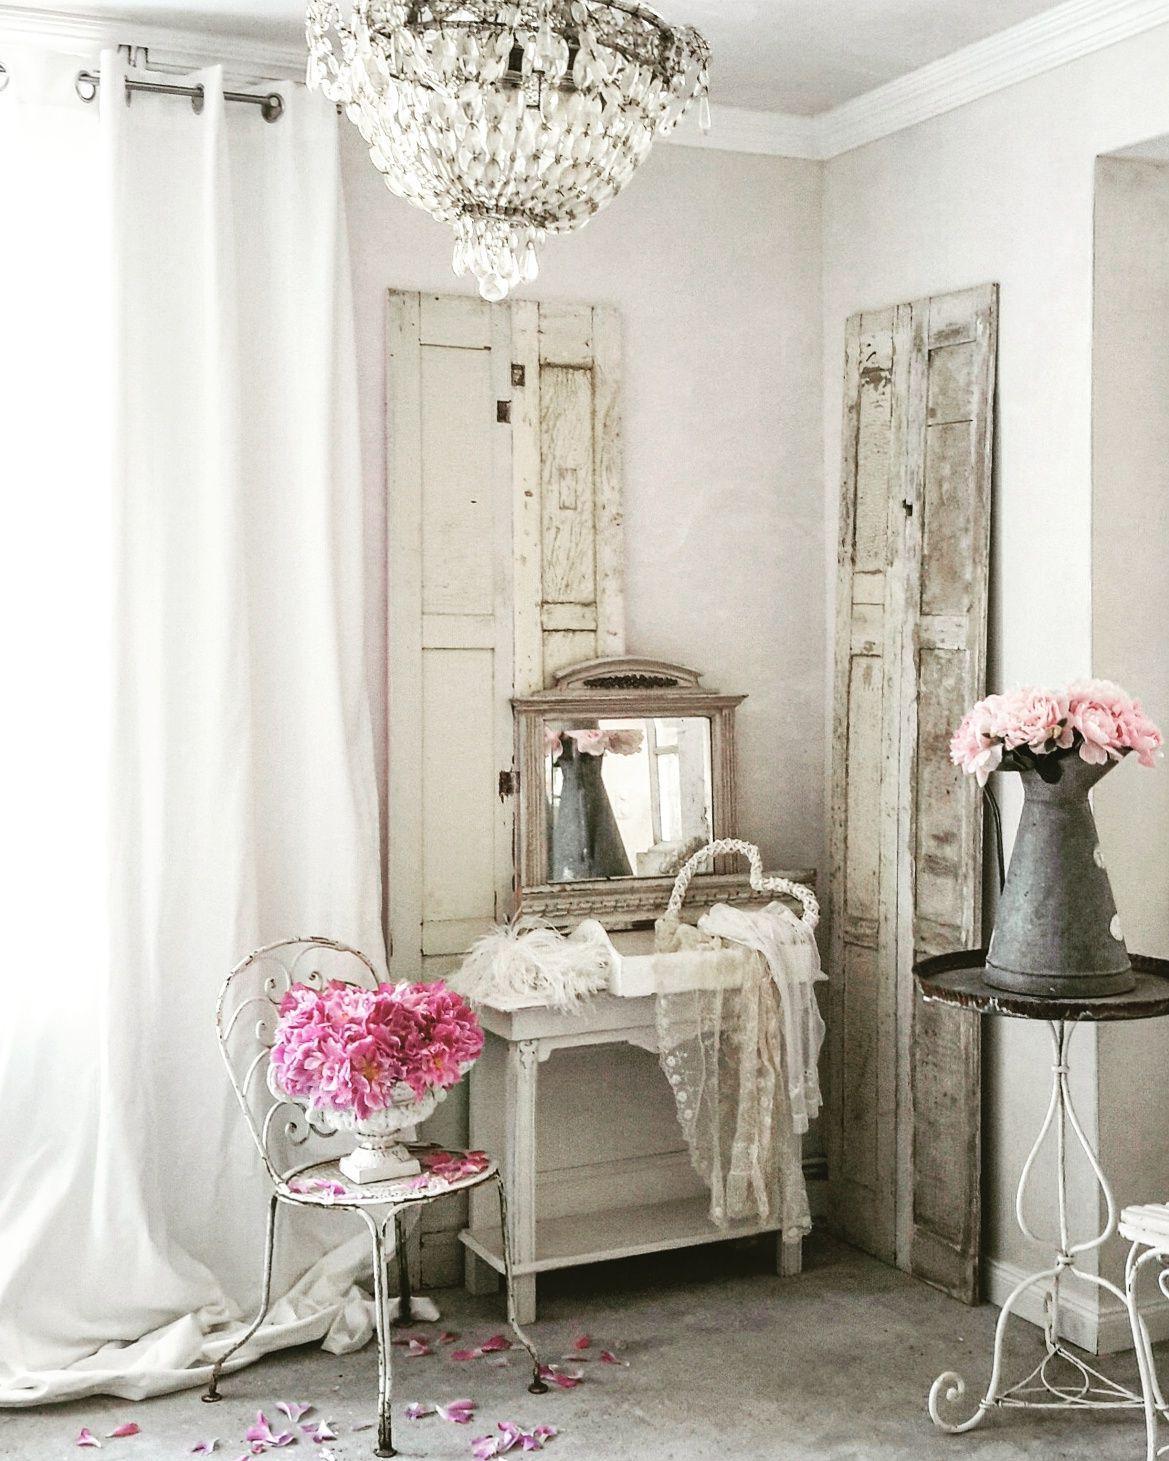 Shabby⚜ | Interieur | Pinterest | Shabby, Interiors and Shabby ...